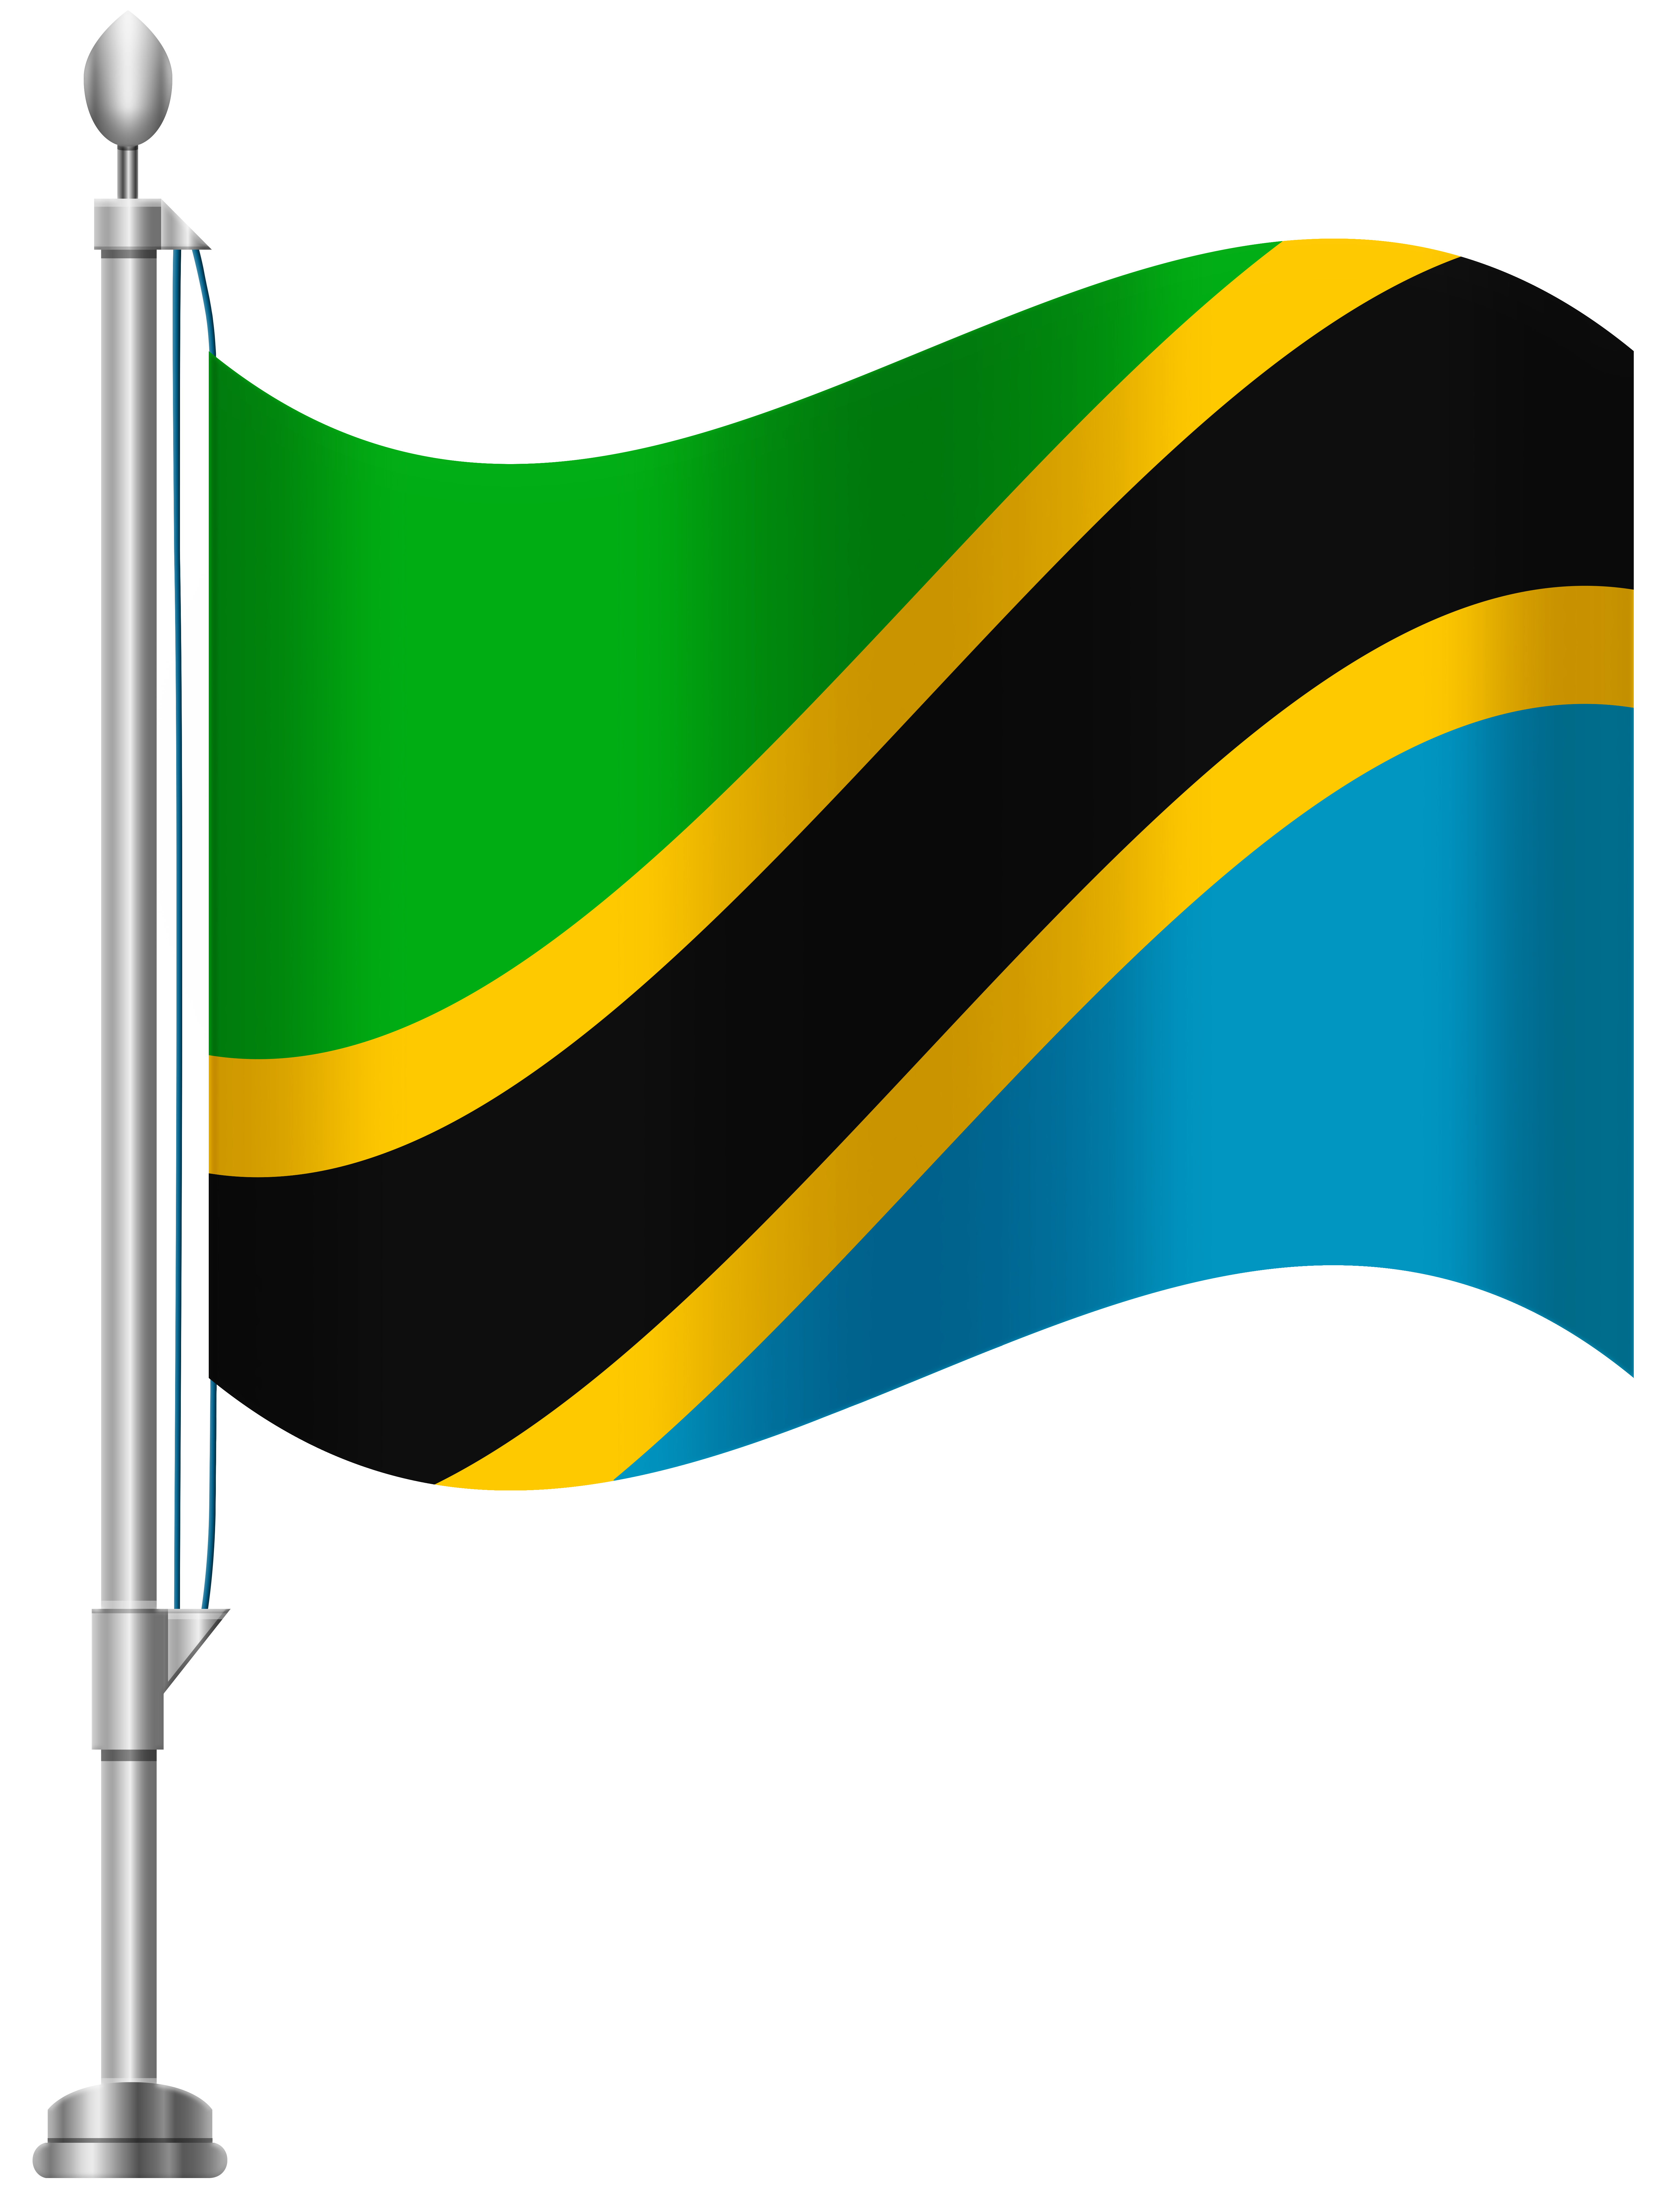 Tanzania clipart #3, Download drawings